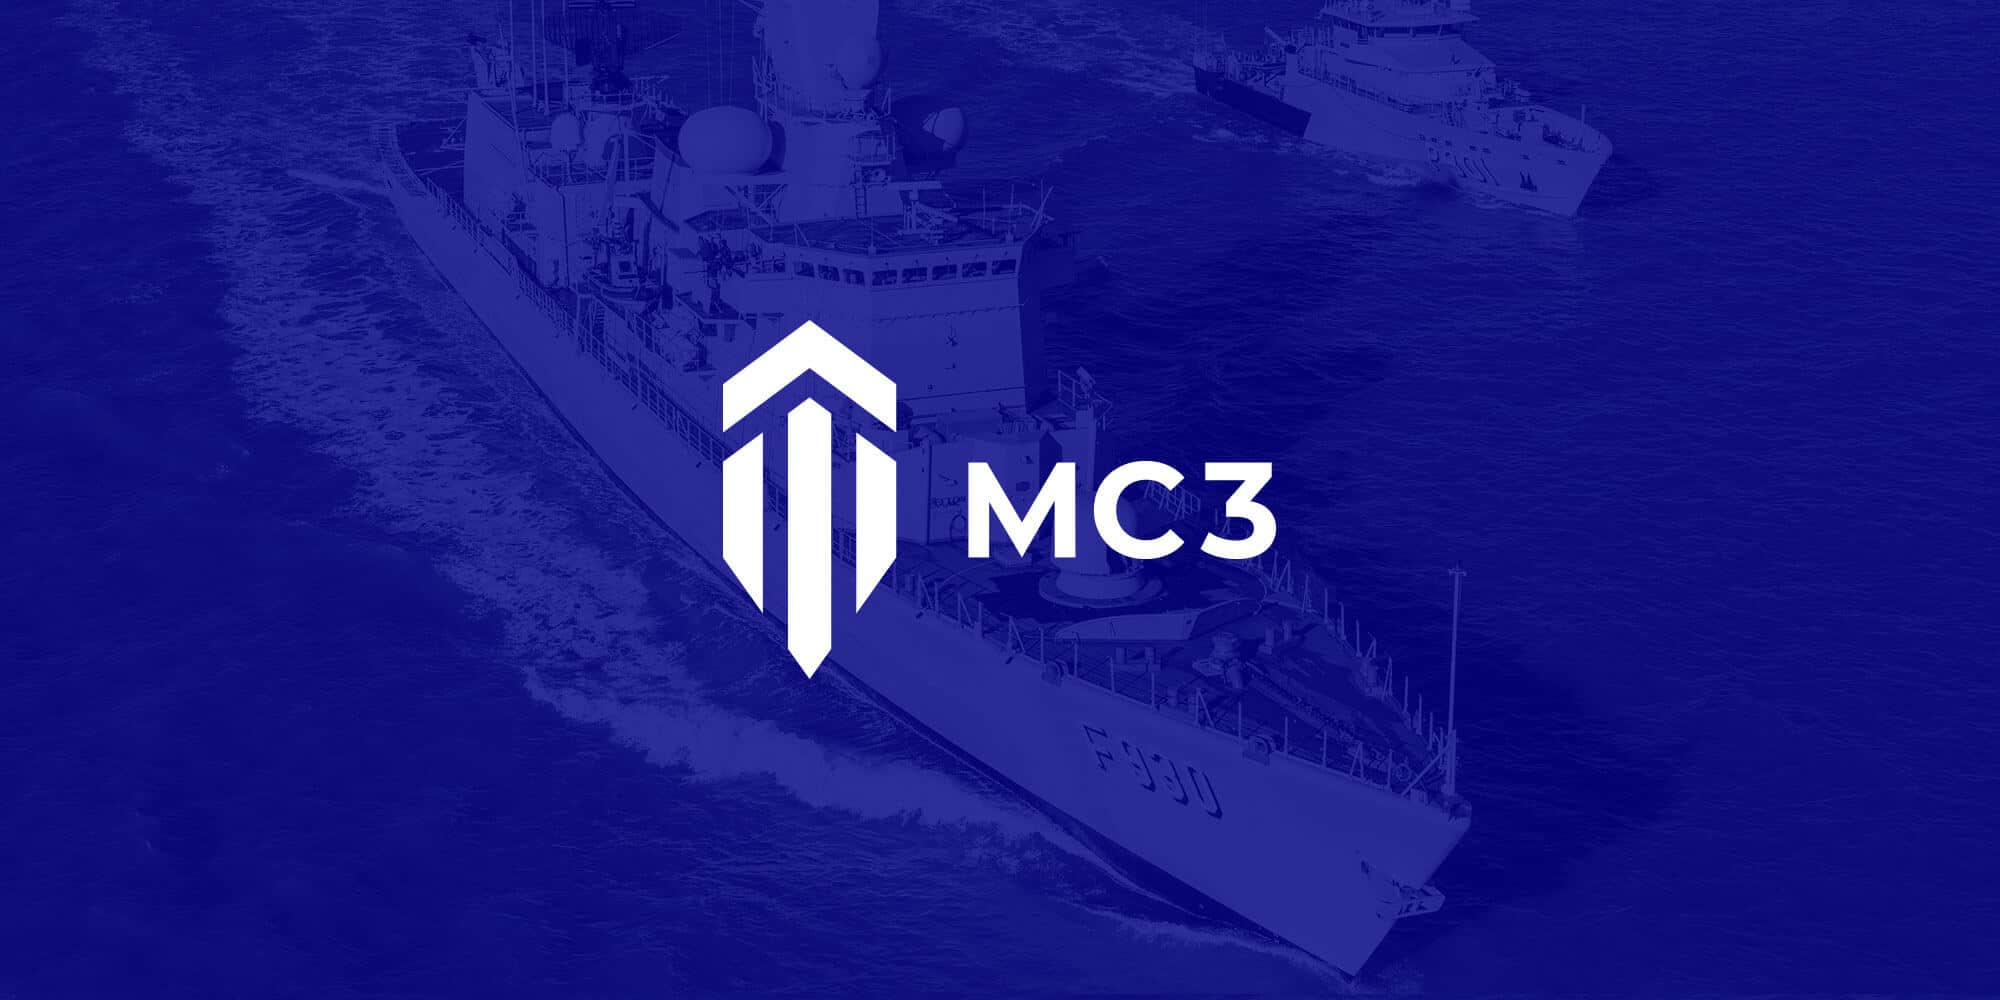 Logo MC3